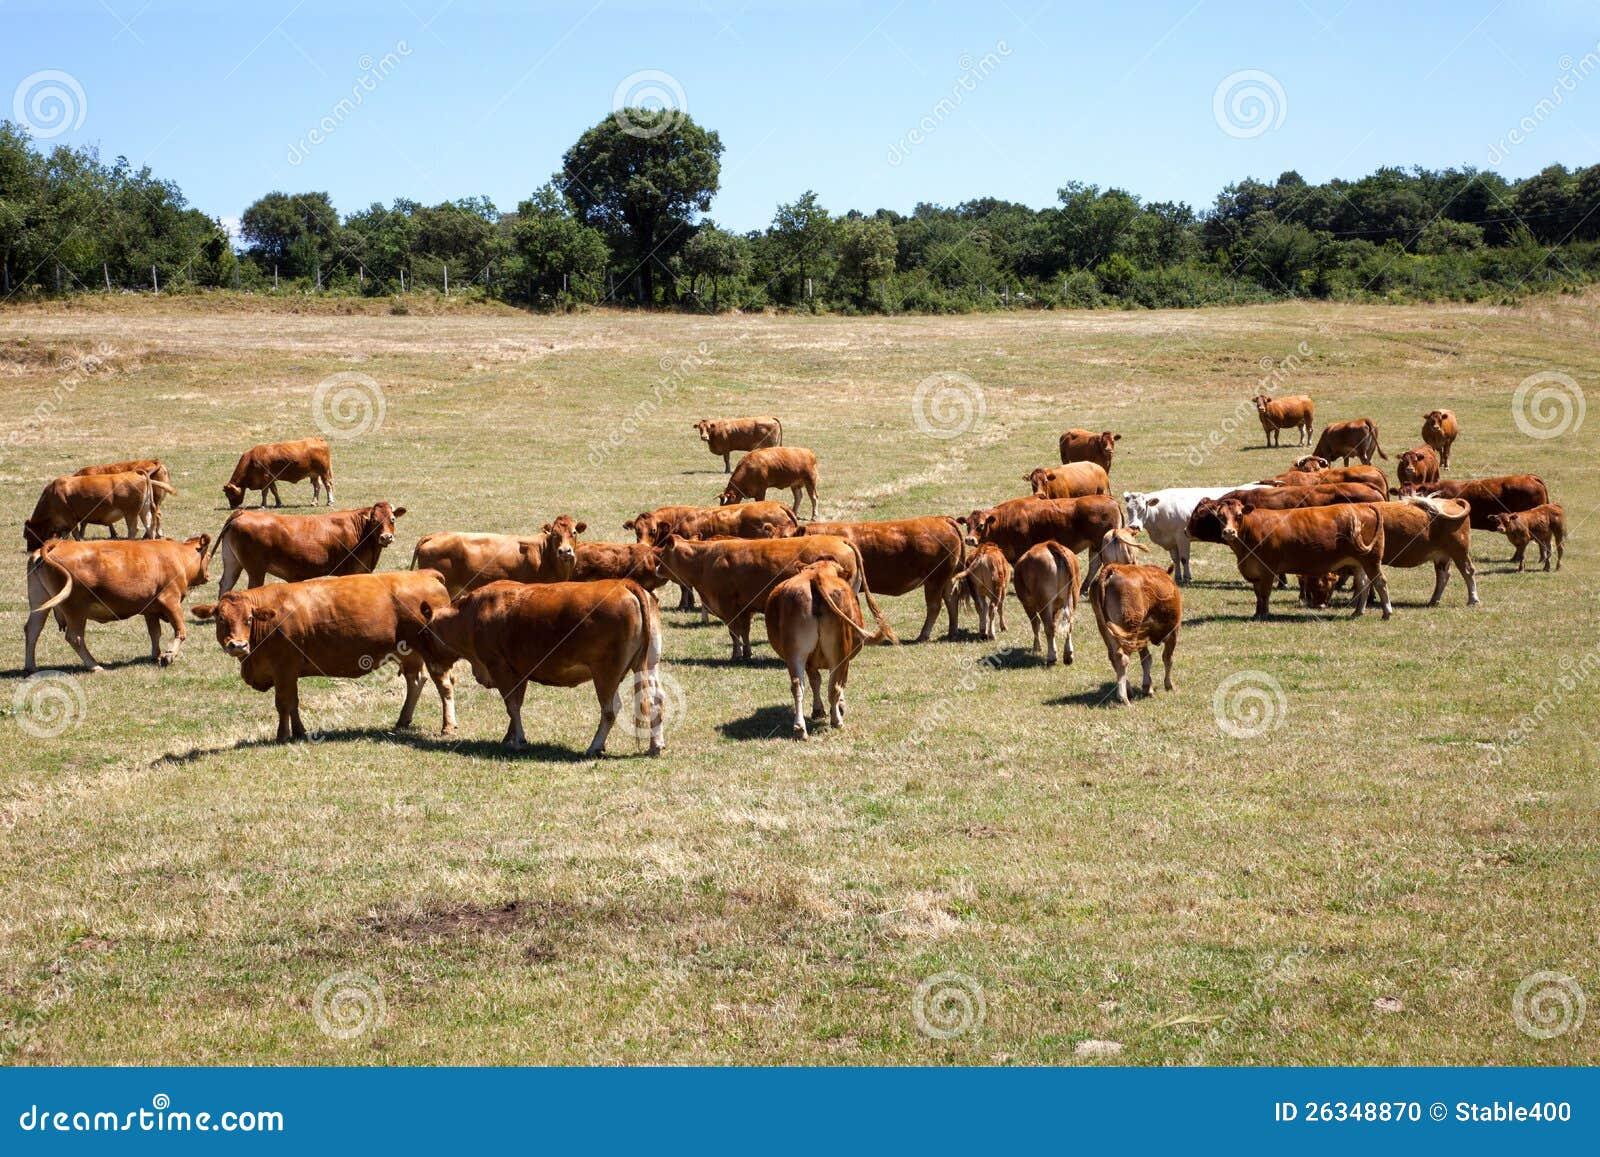 Cattle Grazing Stock Photo - Image: 26348870